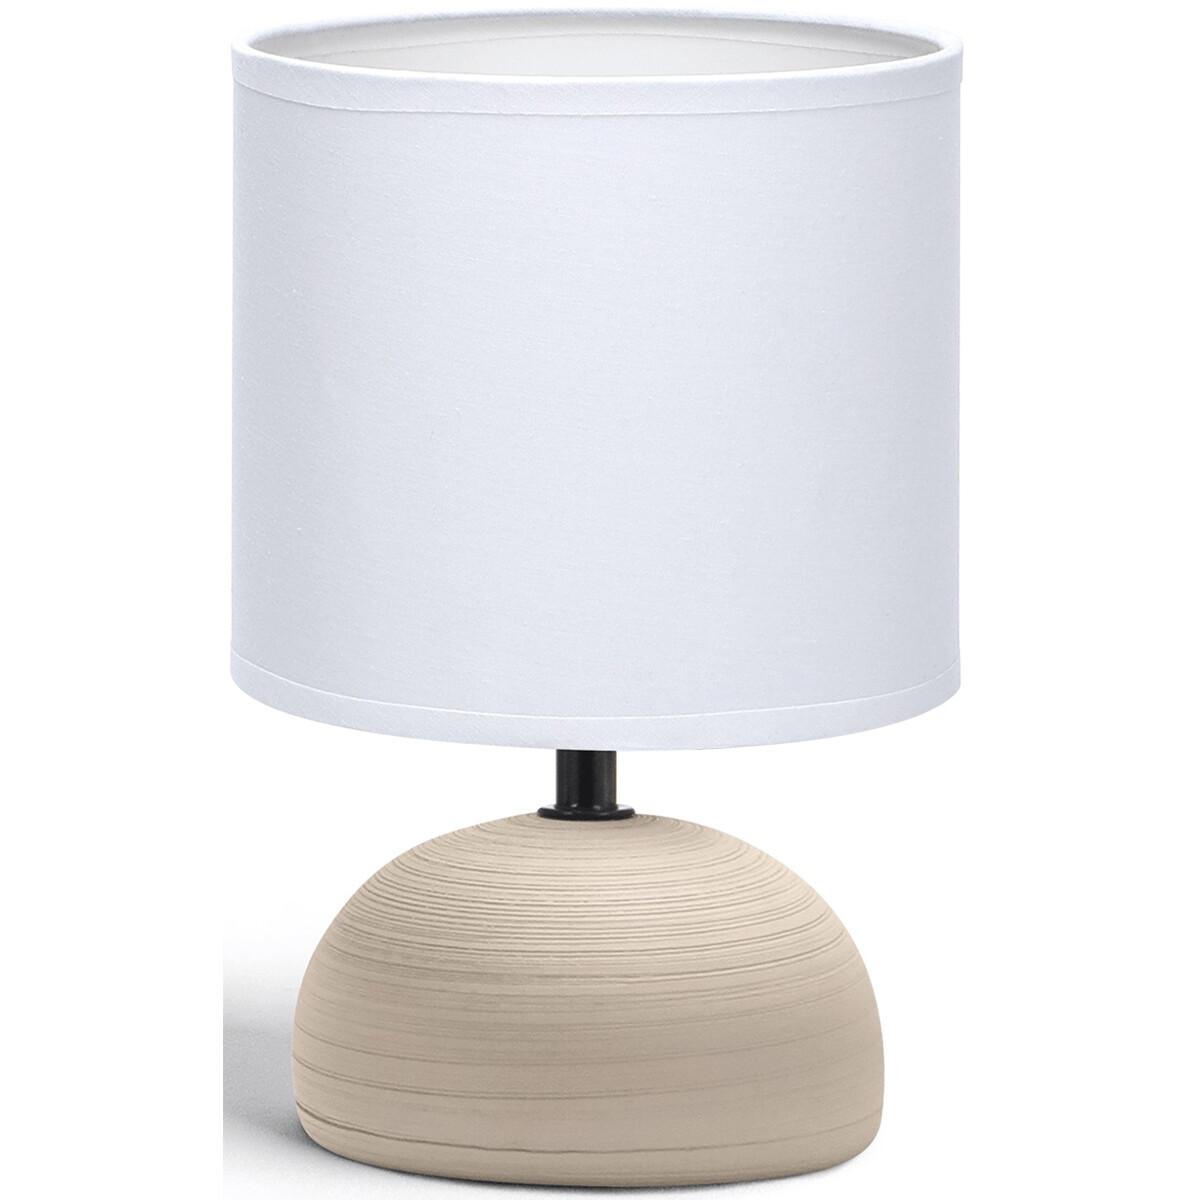 LED Tafellamp - Tafelverlichting - Aigi Conton 2 - E14 Fitting - Rond - Mat Bruin - Keramiek